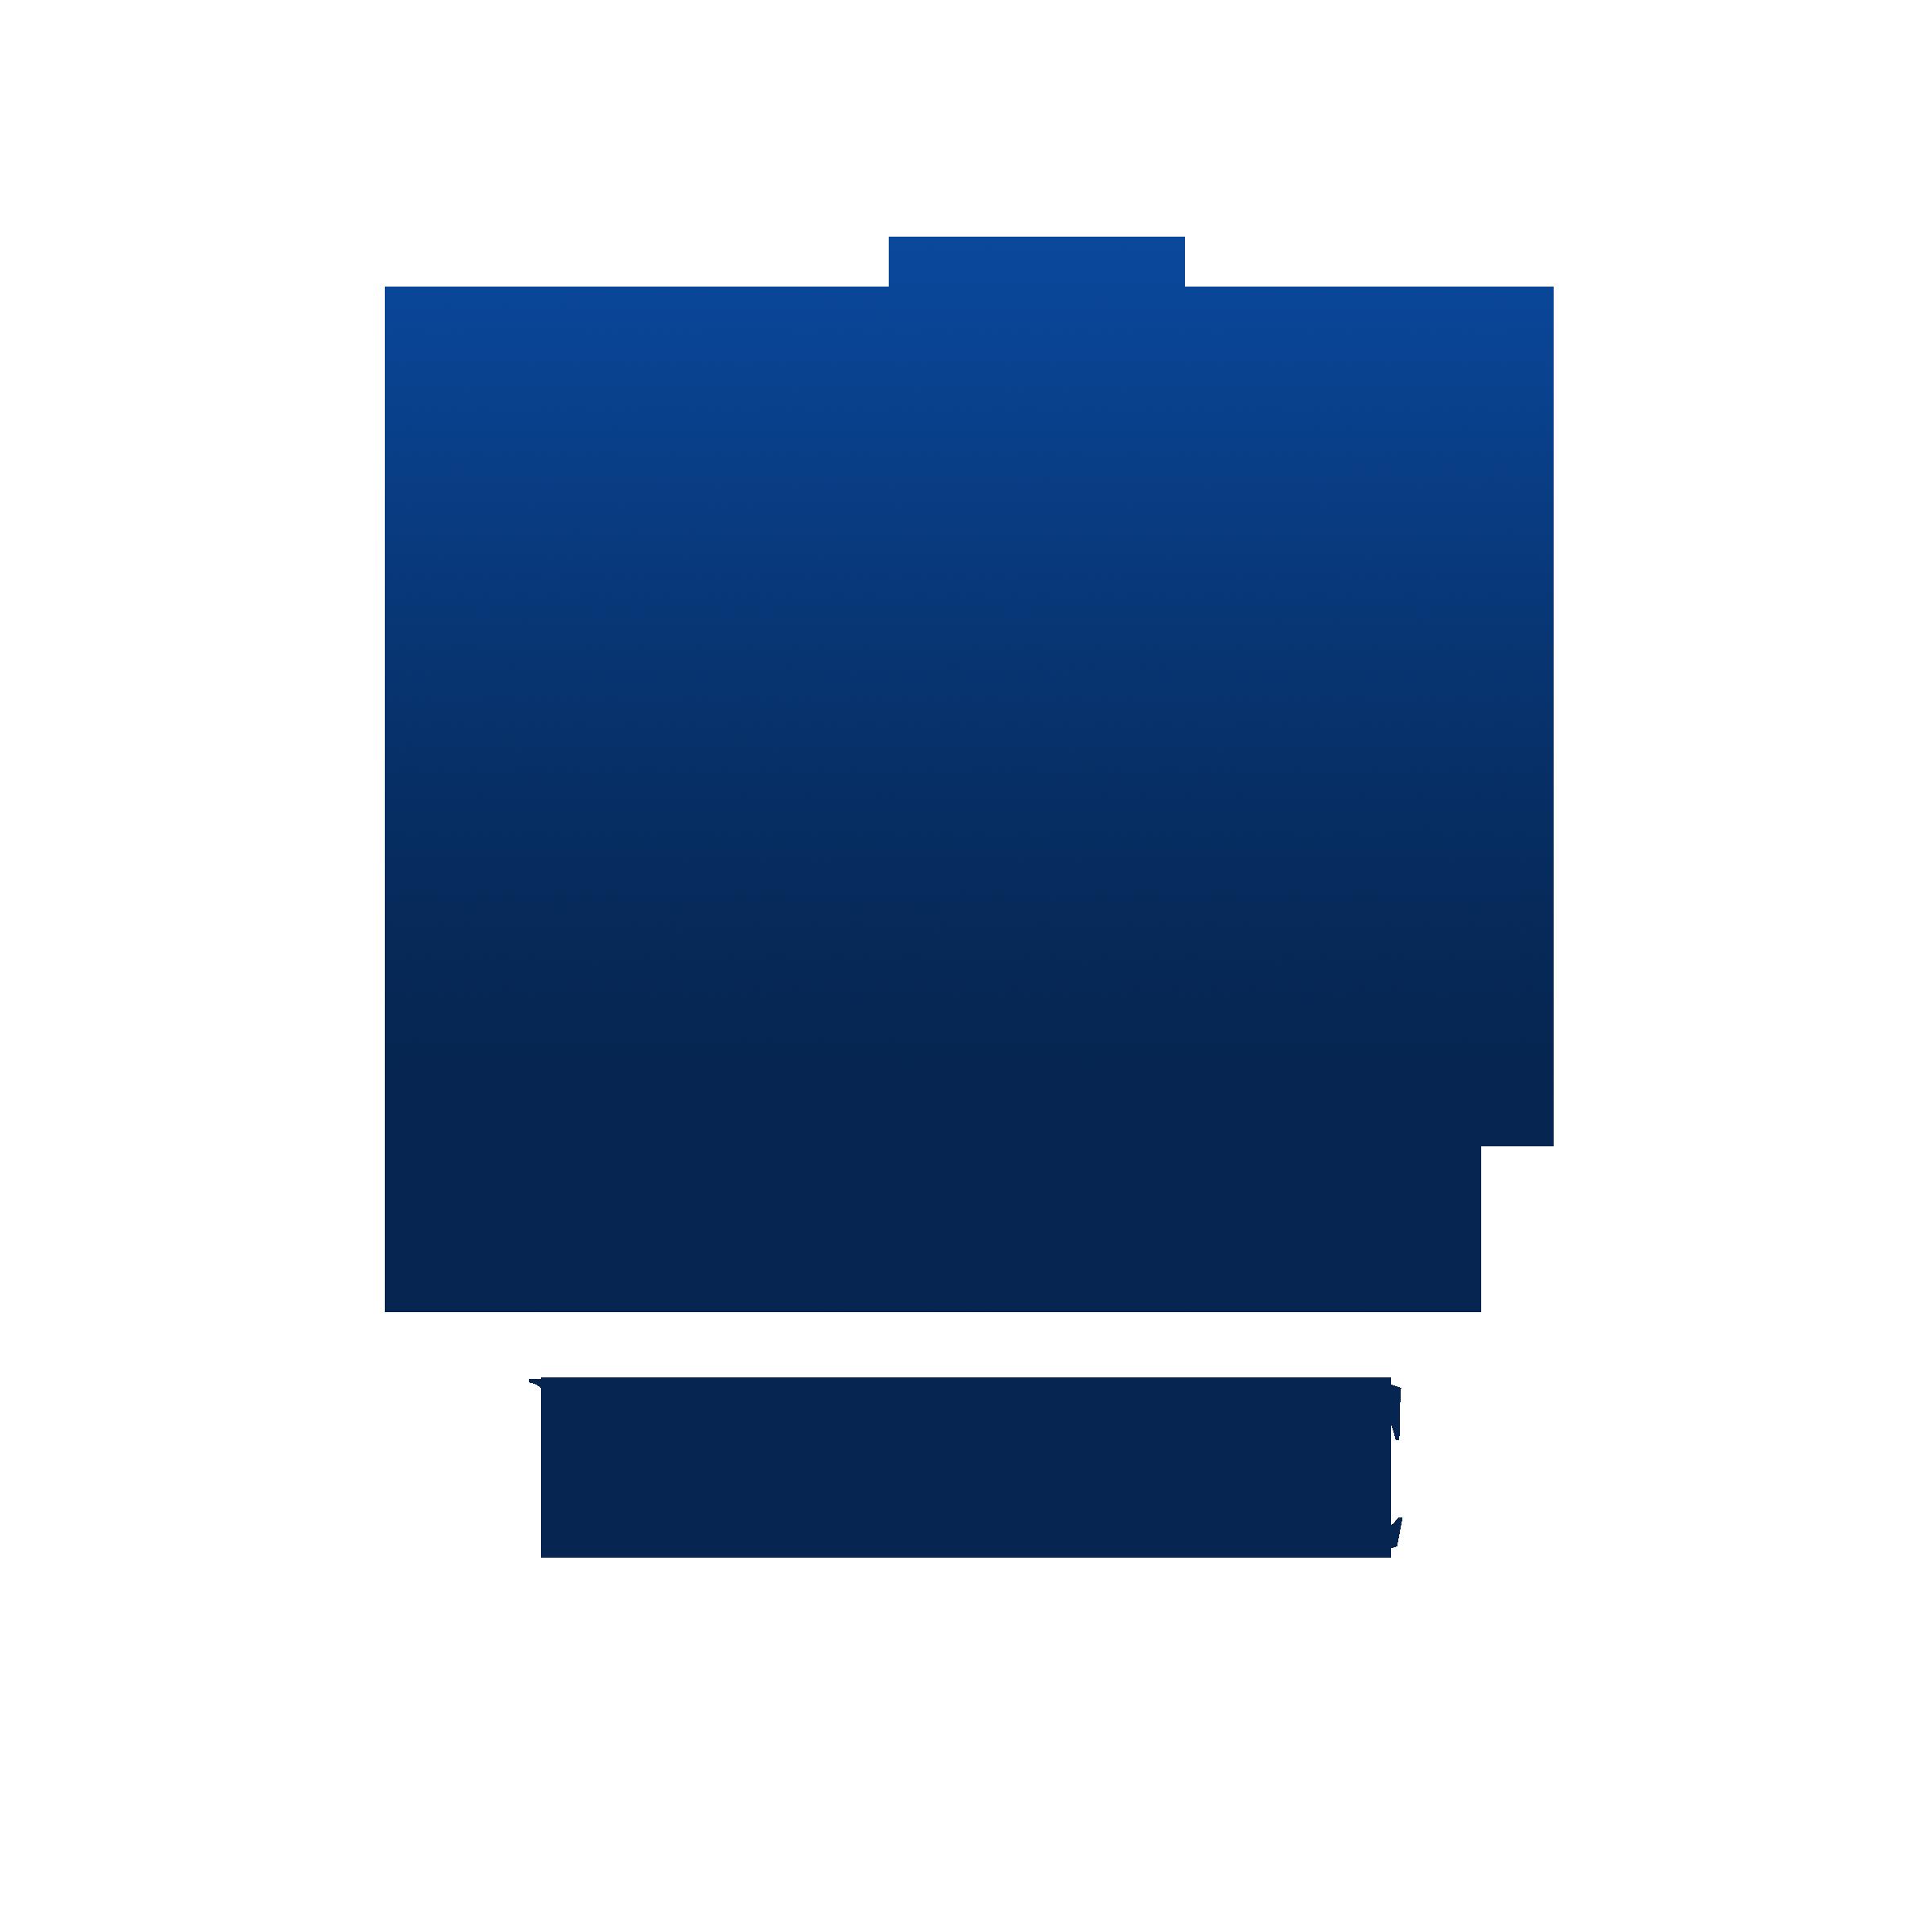 UNSC – FORMUN Society